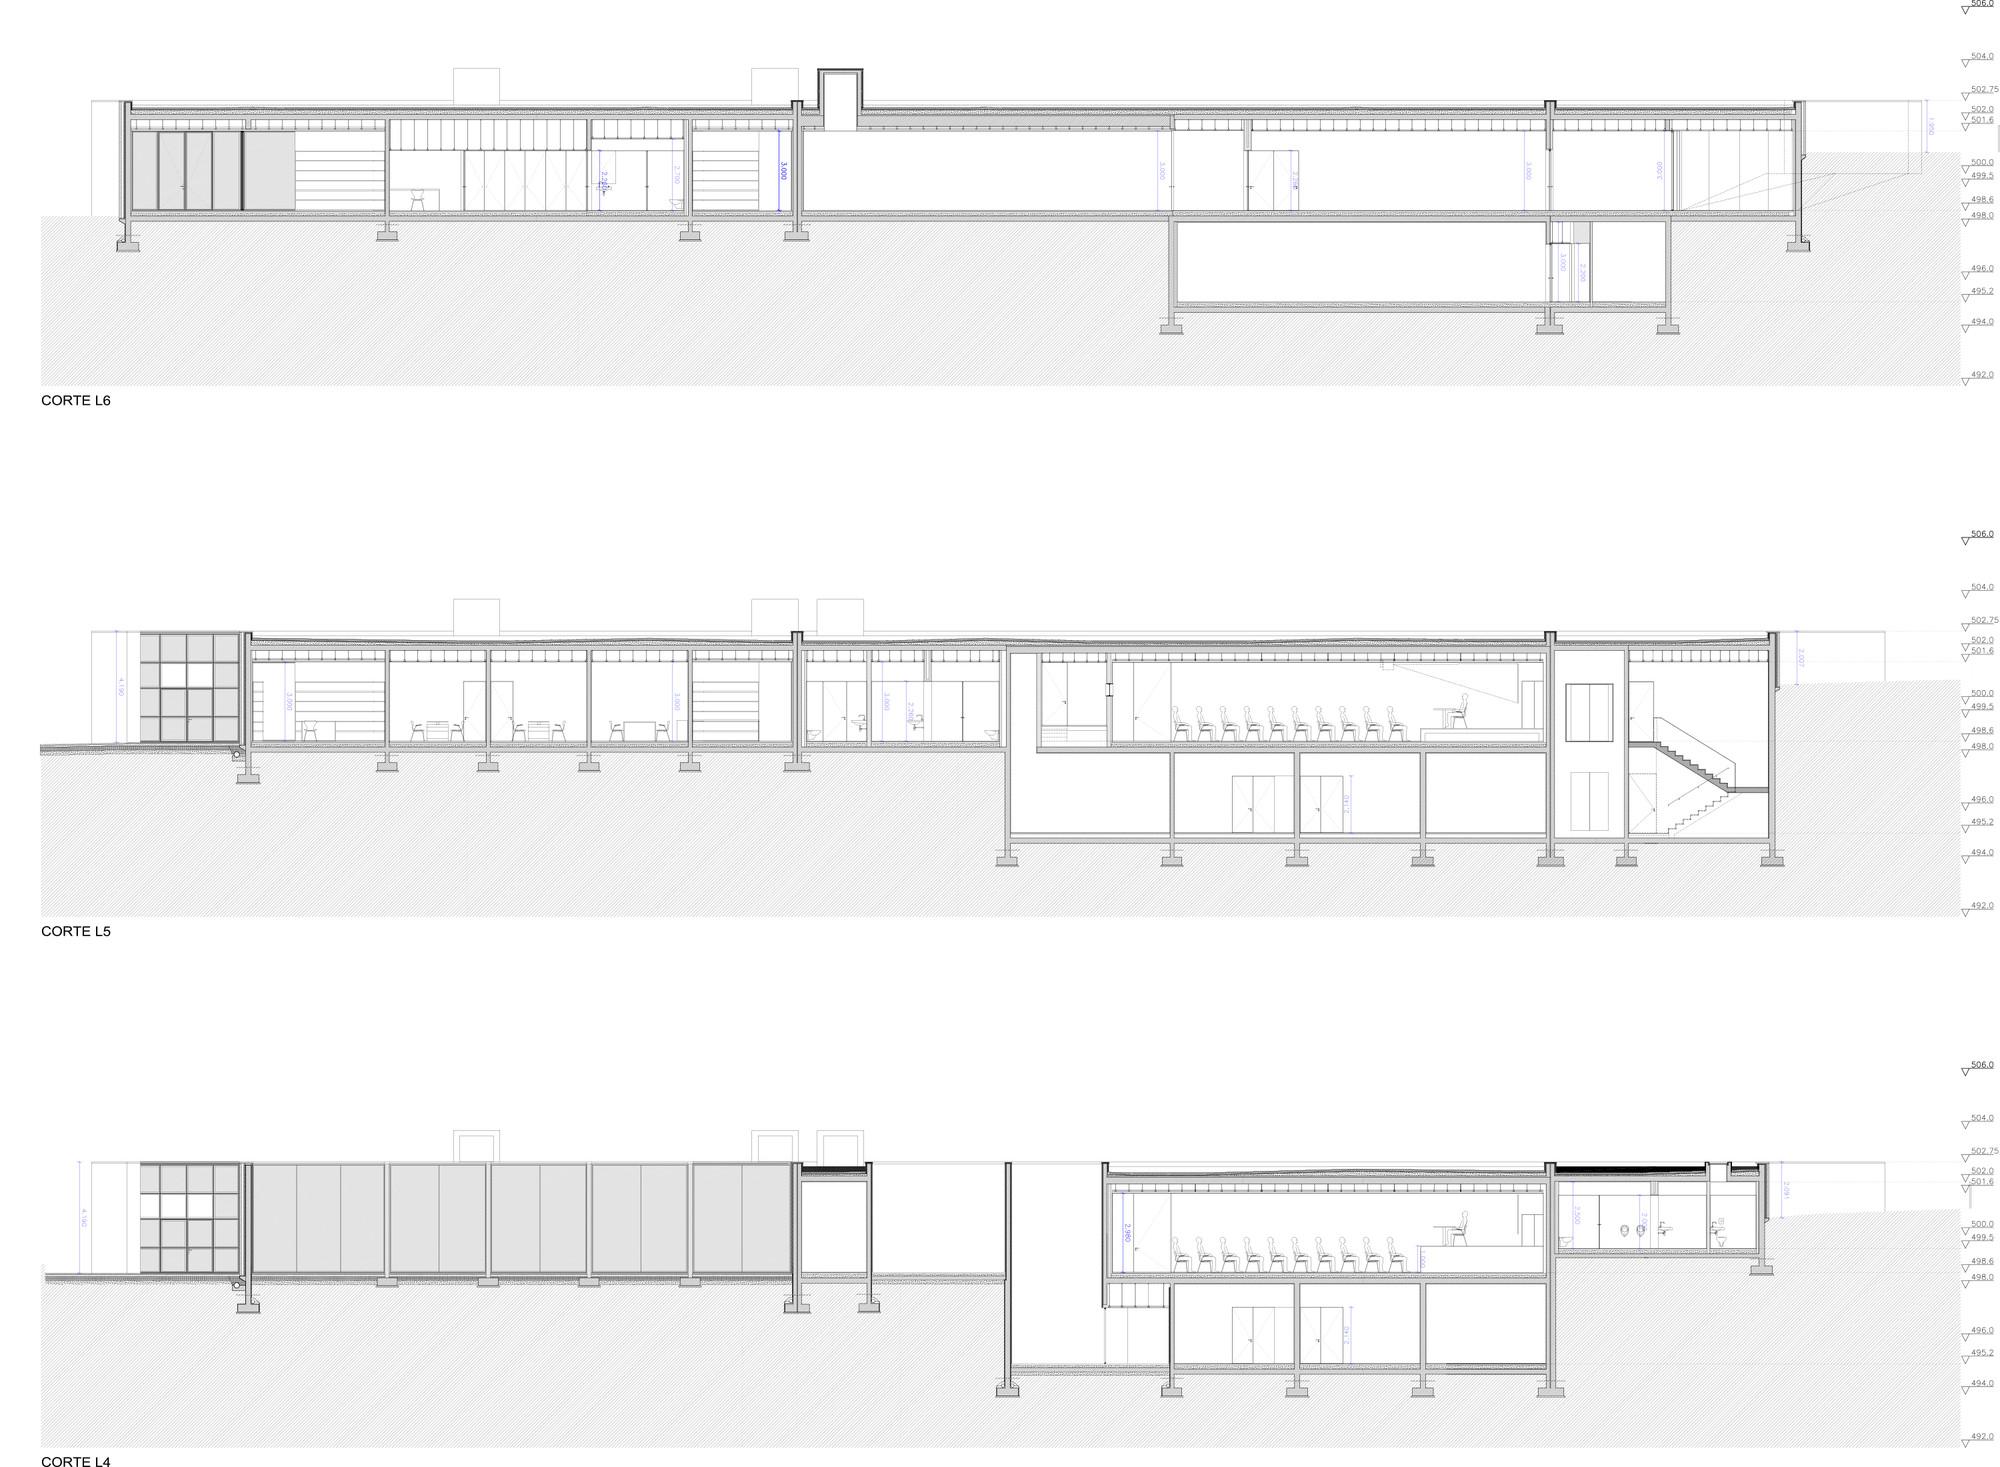 gallery of miguel torga space eduardo souto de moura 22. Black Bedroom Furniture Sets. Home Design Ideas